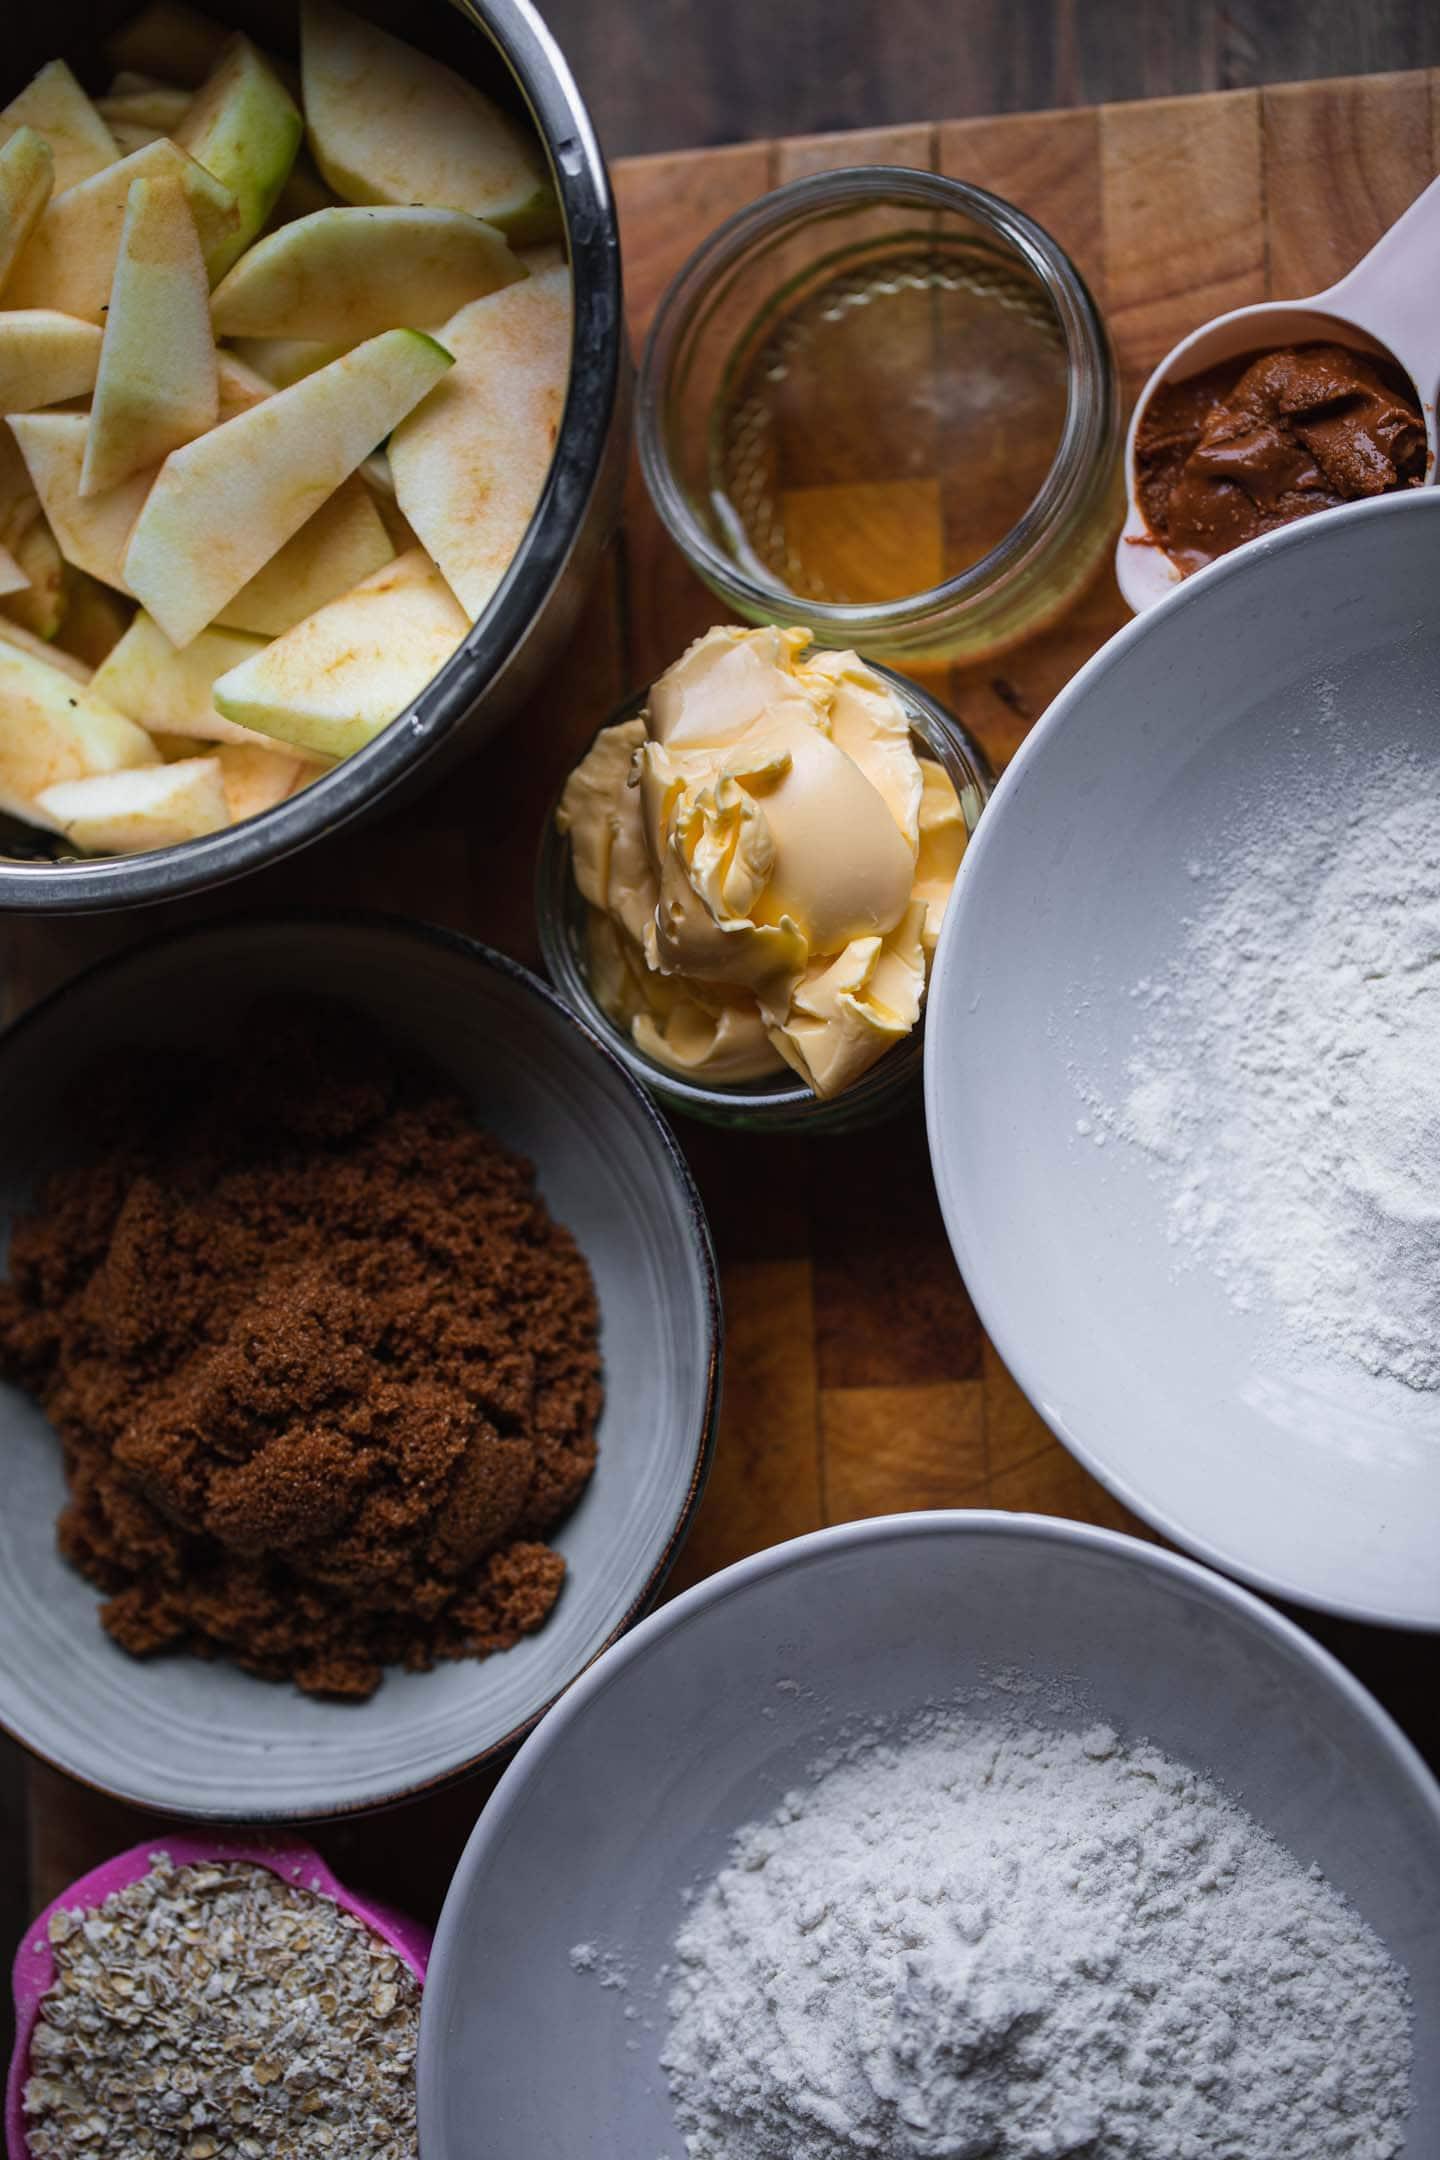 Ingredients for vegan apple crumble